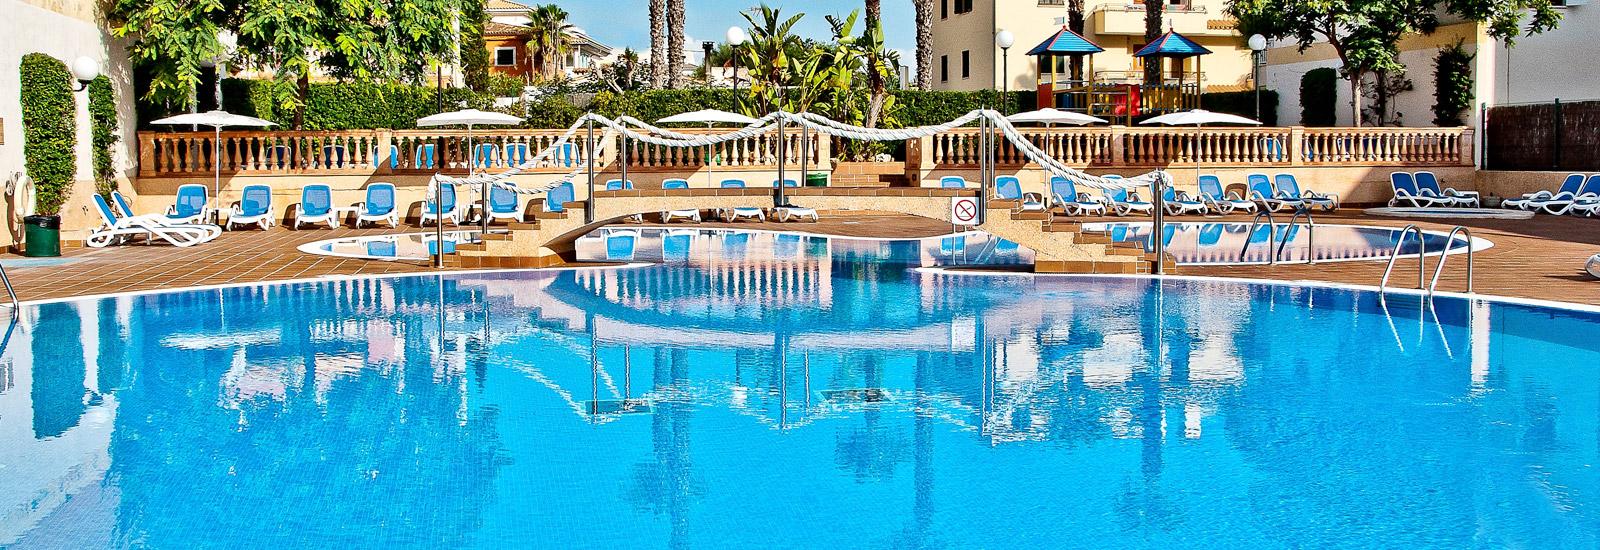 (LTUR:com) 2 Personen 6 Tage / 5 Nächte Mallorca , Flug & 4 Sterne-Hotel mit 93% HolidayCheck + Transfer, Zug zum Flug und Halbpension (288€/Person) (viele Abflughäfen, in April, Mai ab 299€)